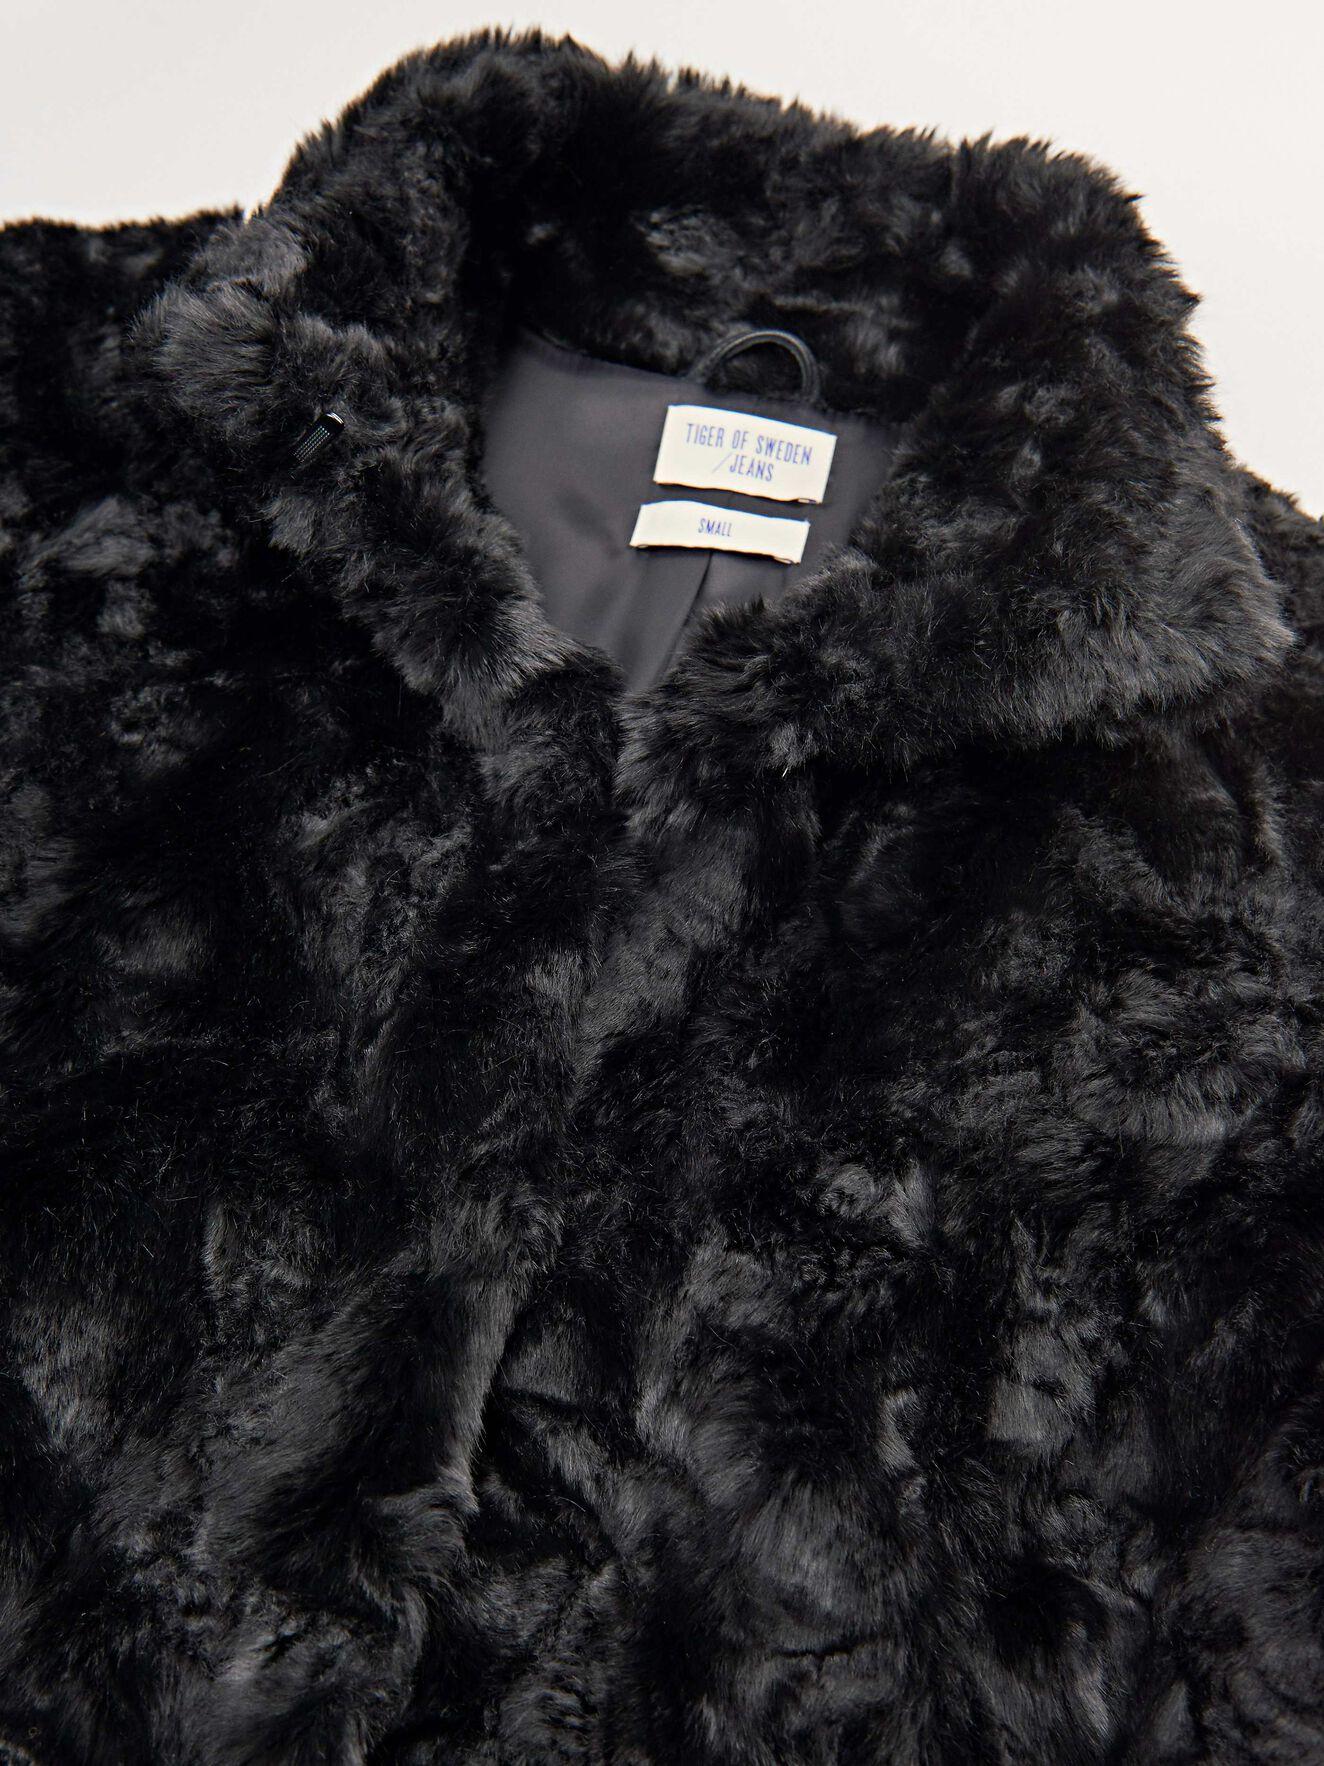 873ae0f8099 Minimal Jacket - Buy Outerwear online